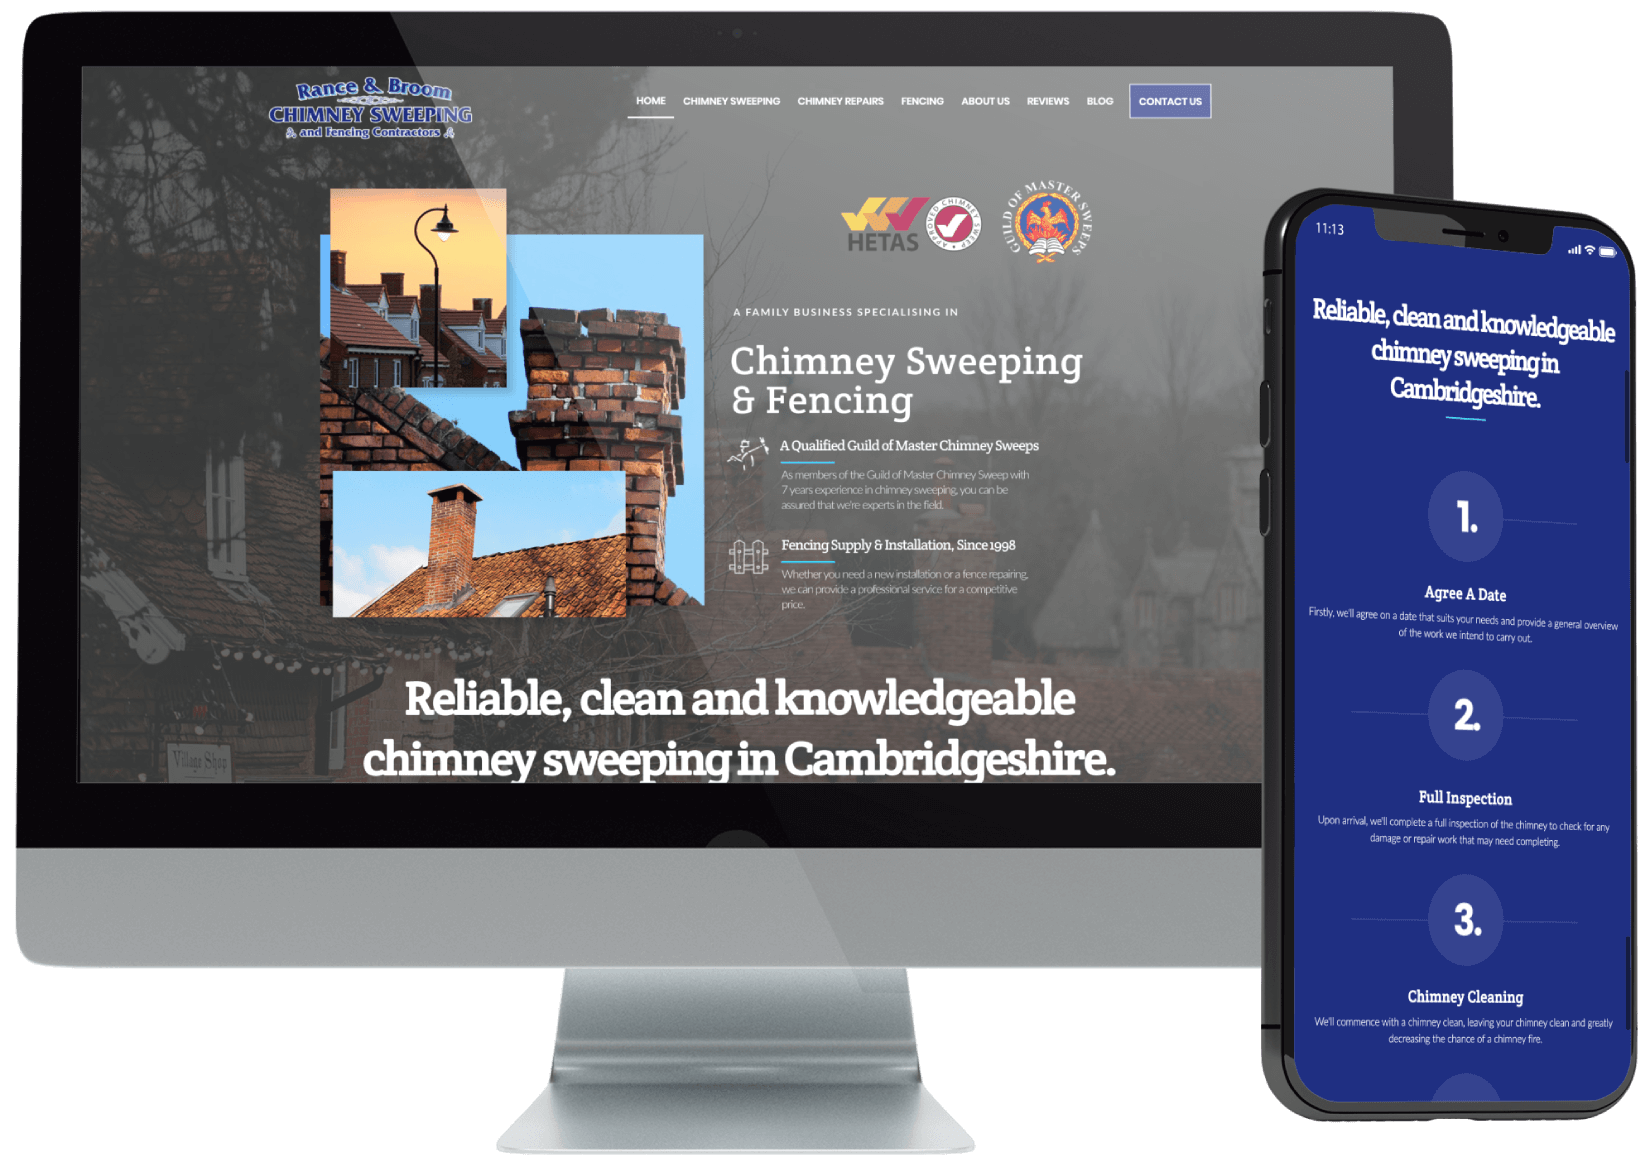 Rance & Broom Web Design